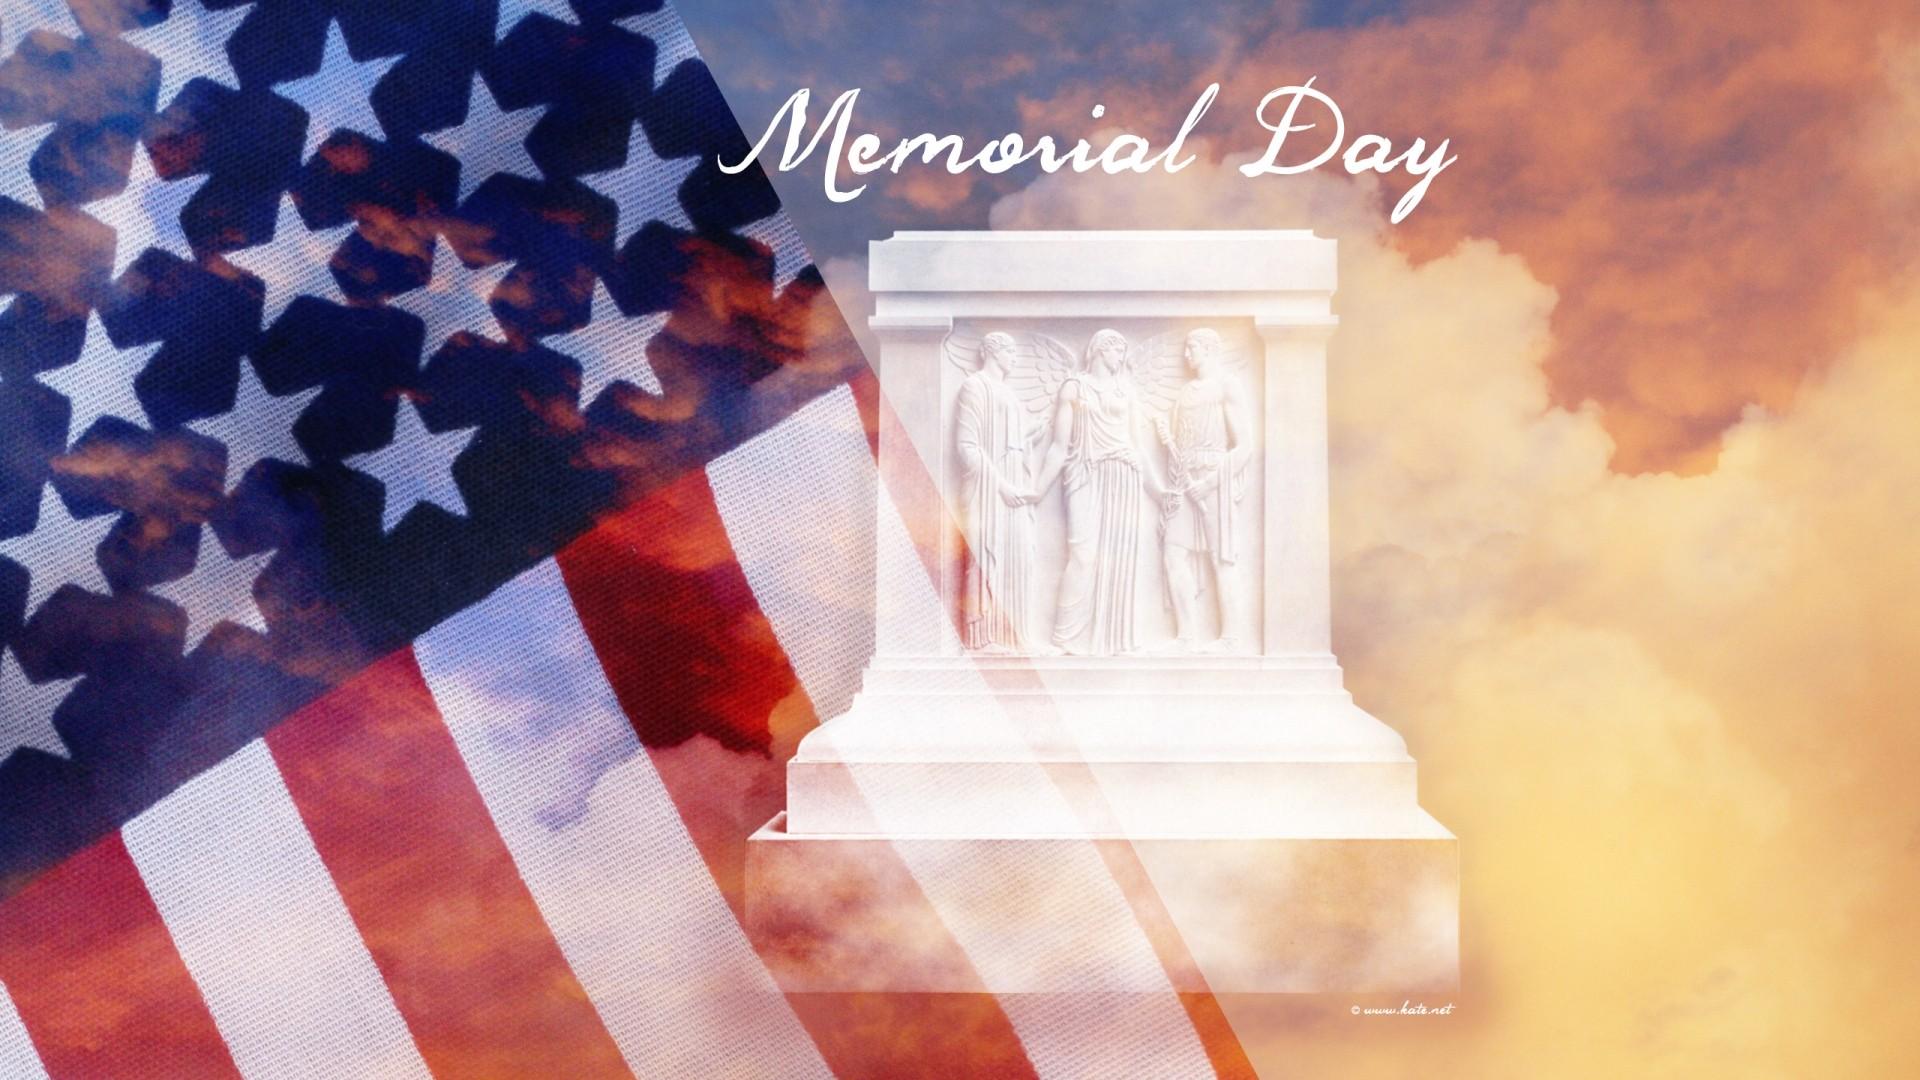 Veterans Day PC Wallpaper HD